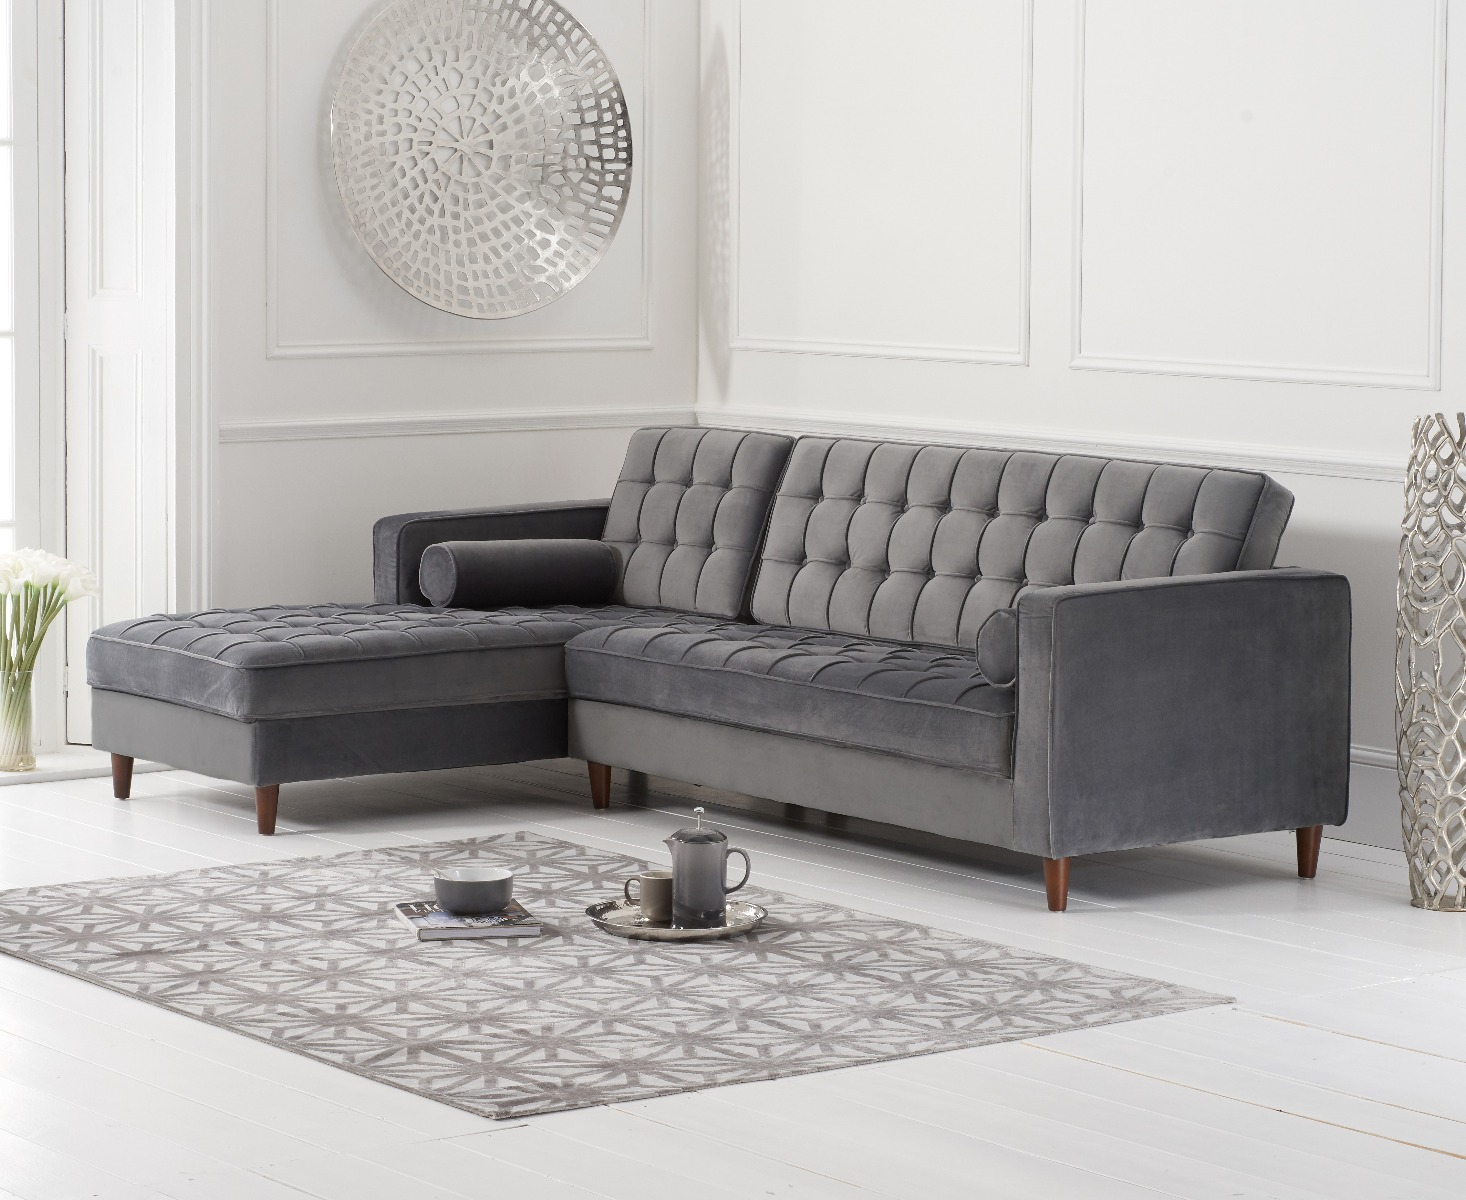 Sensational Atlantic Grey Velvet Left Facing Chaise Sofa Andrewgaddart Wooden Chair Designs For Living Room Andrewgaddartcom